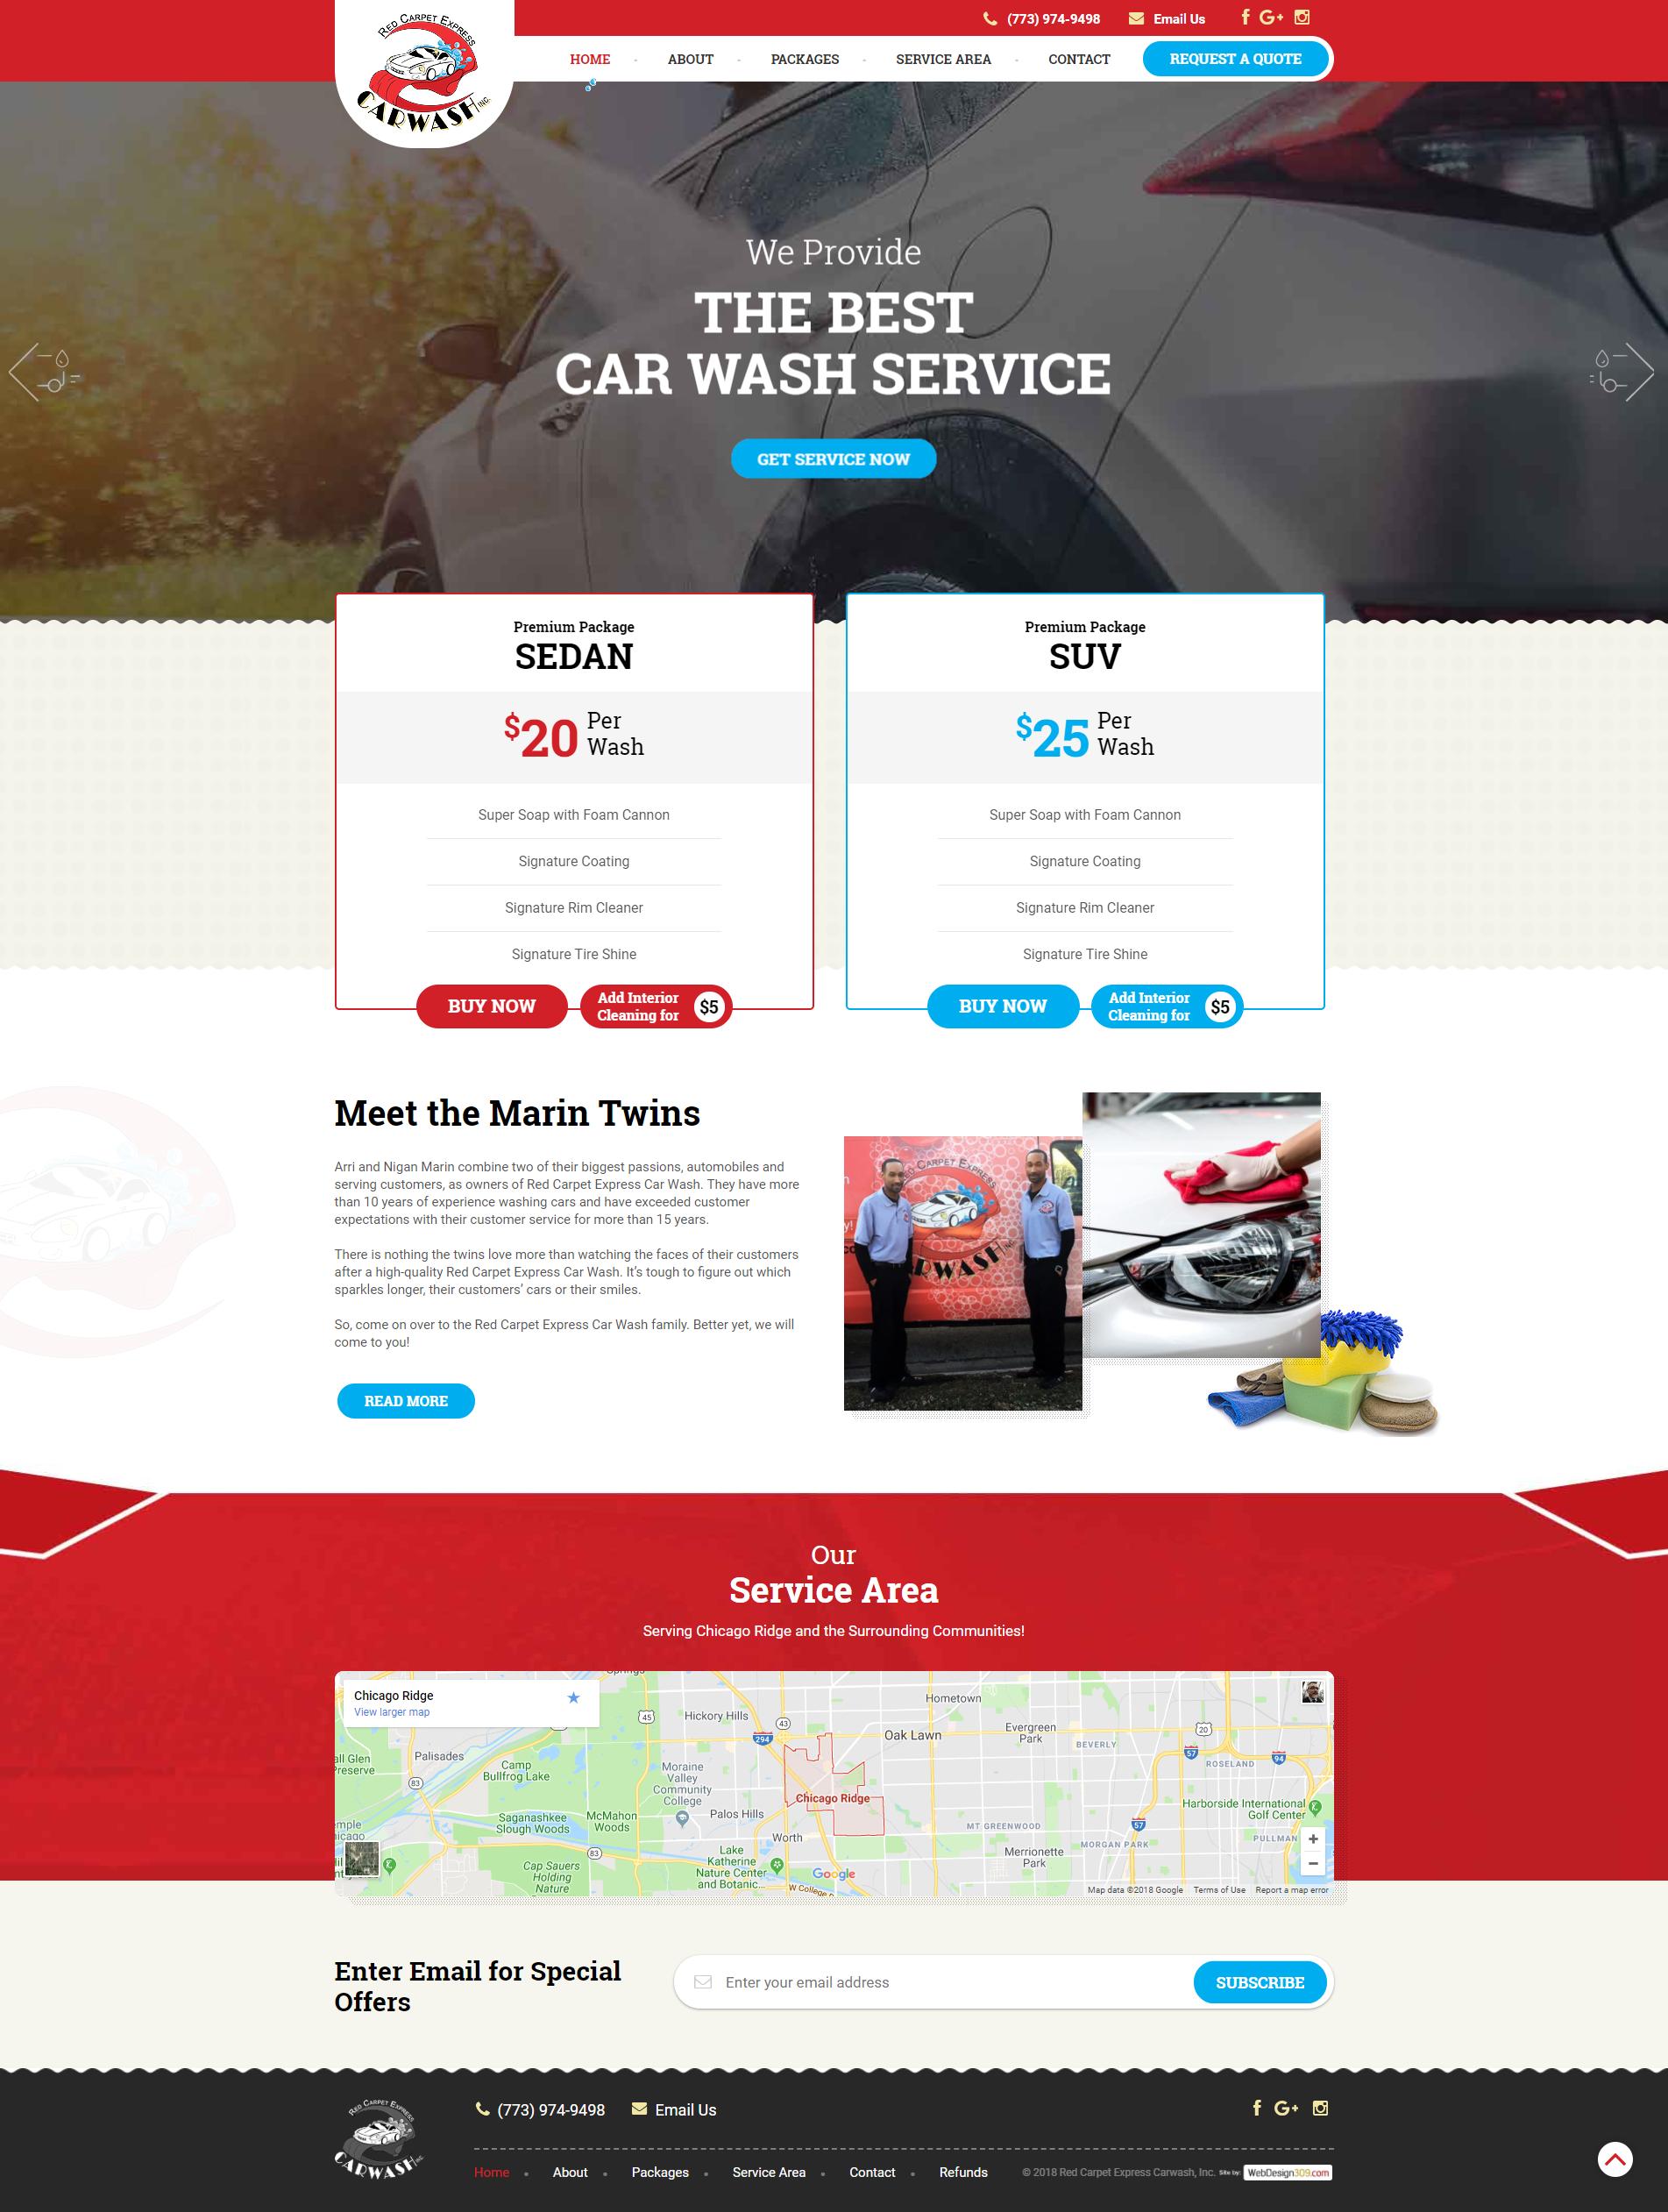 Red Carpet Express Car Wash Mobile Car Wash Servicing The